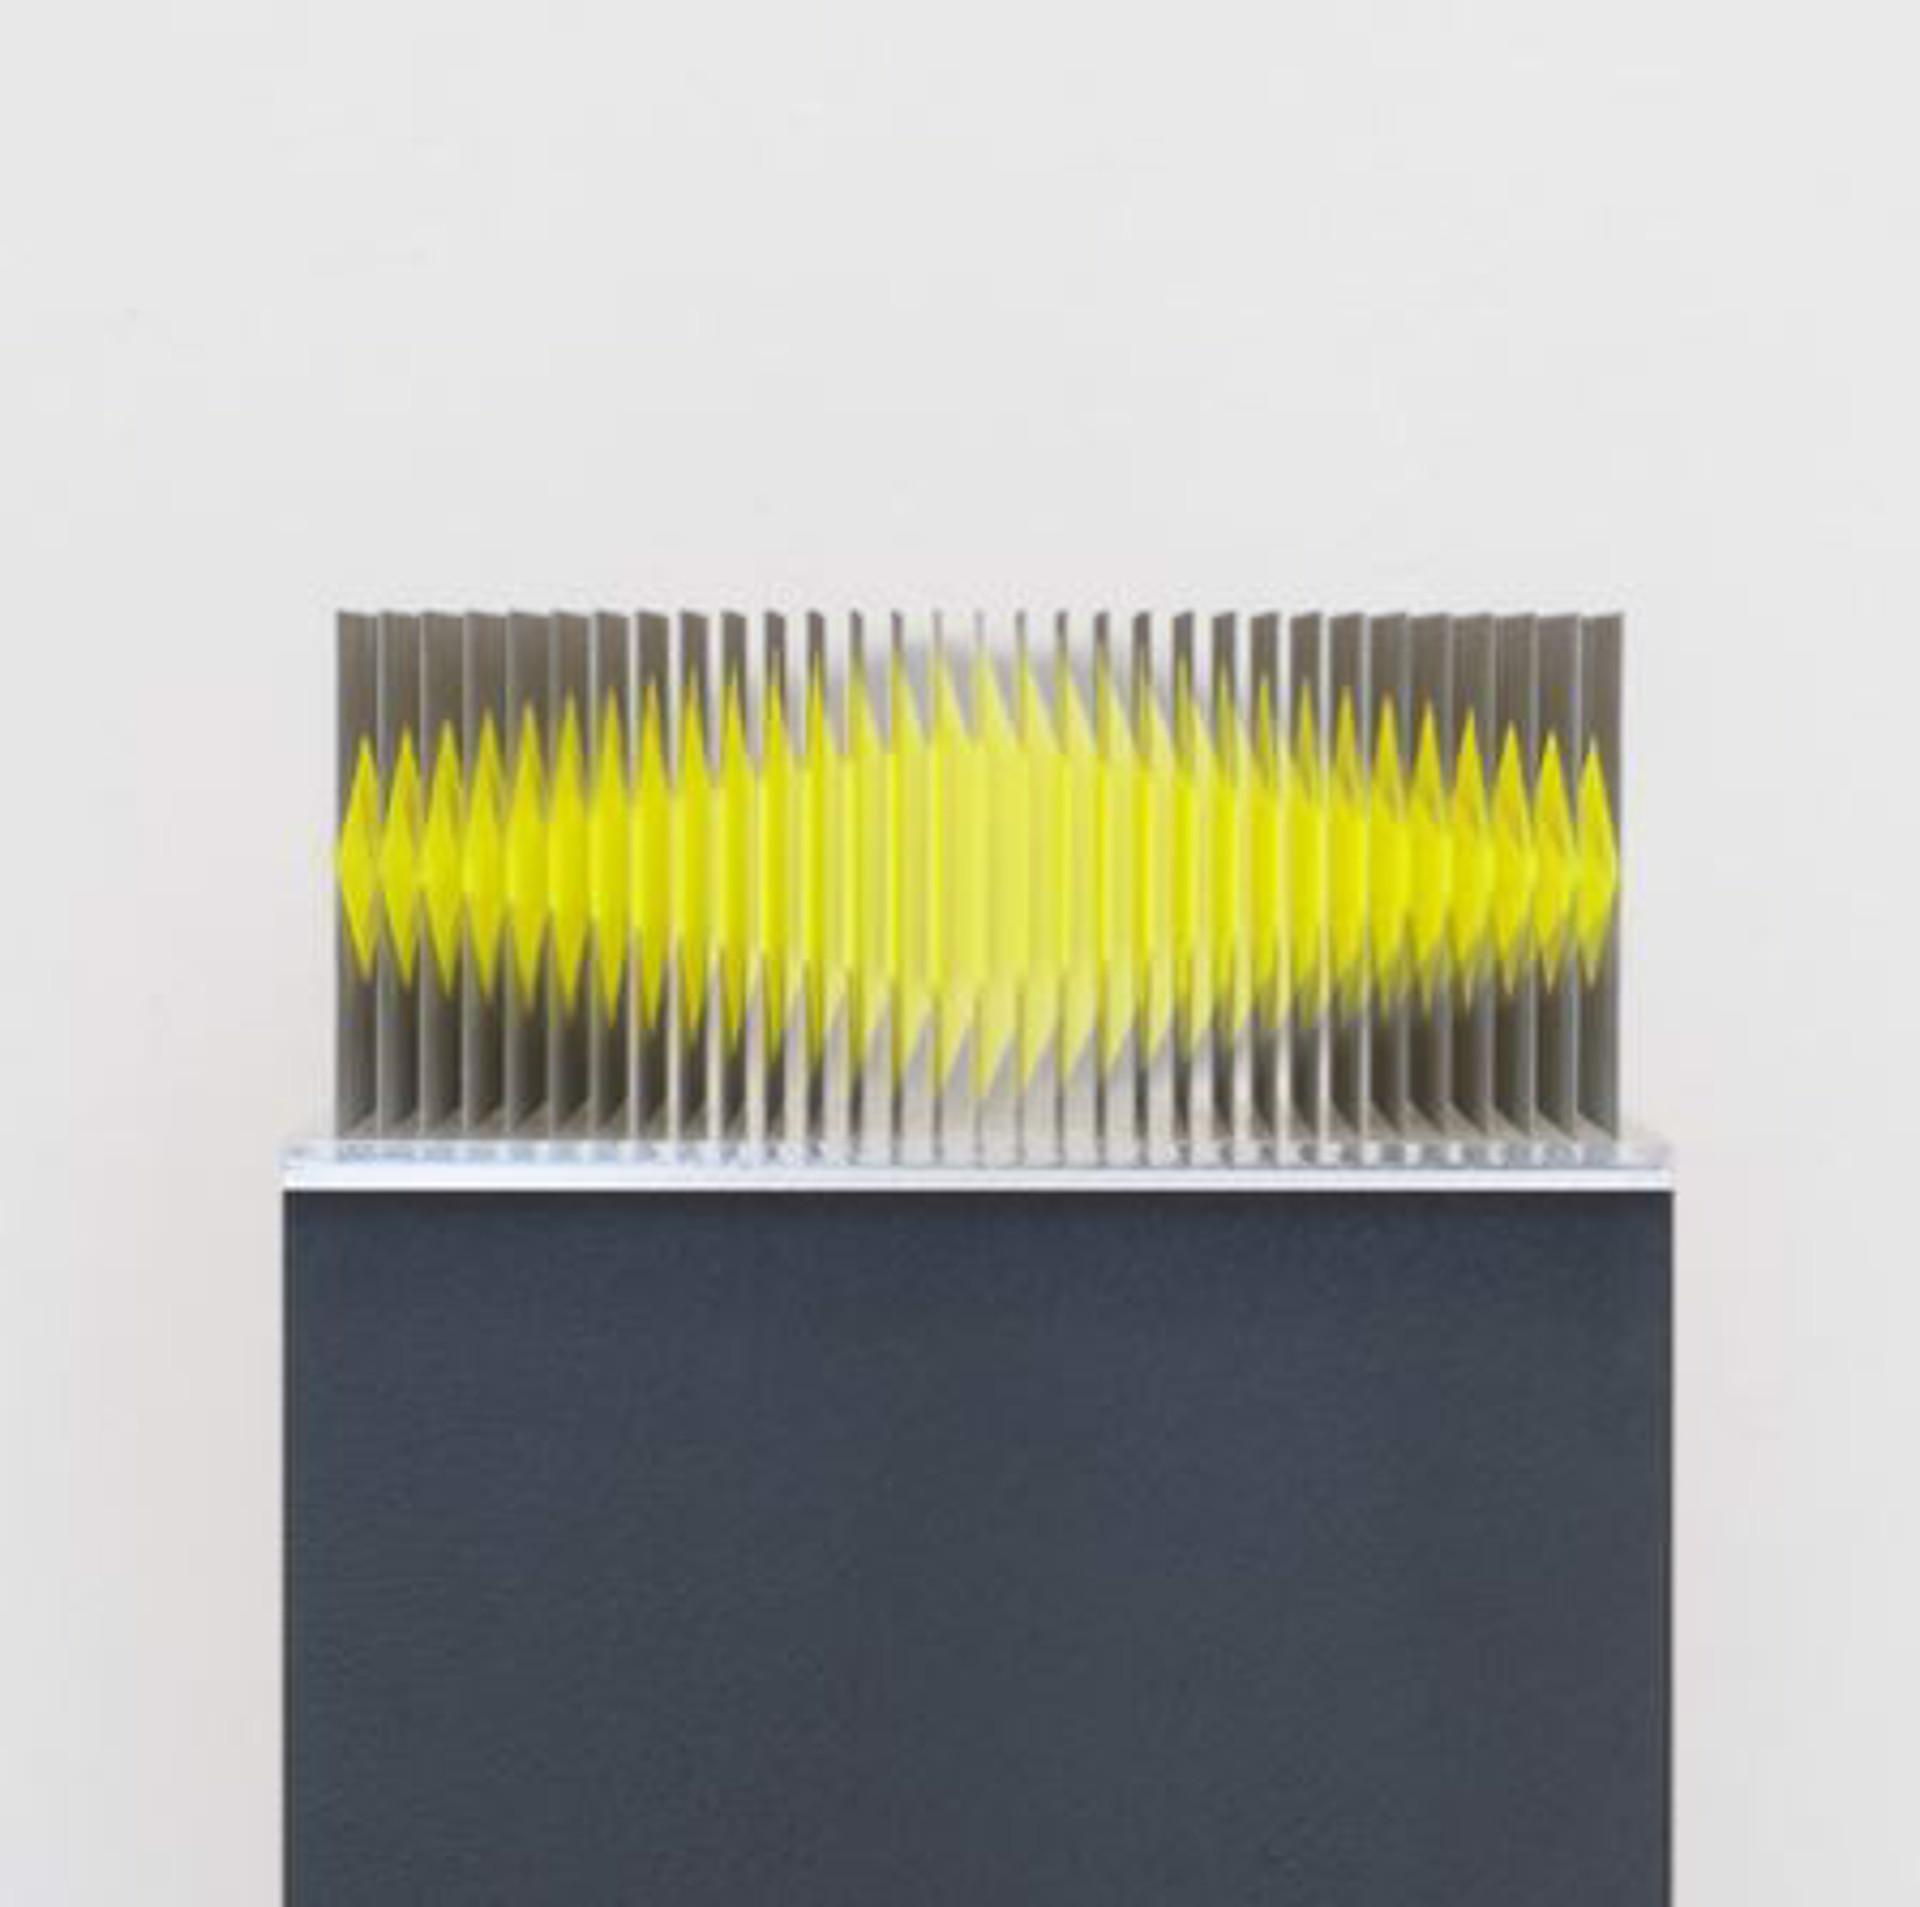 Neongelb 12 Flachen Objekt by Yoshiyuki Miura